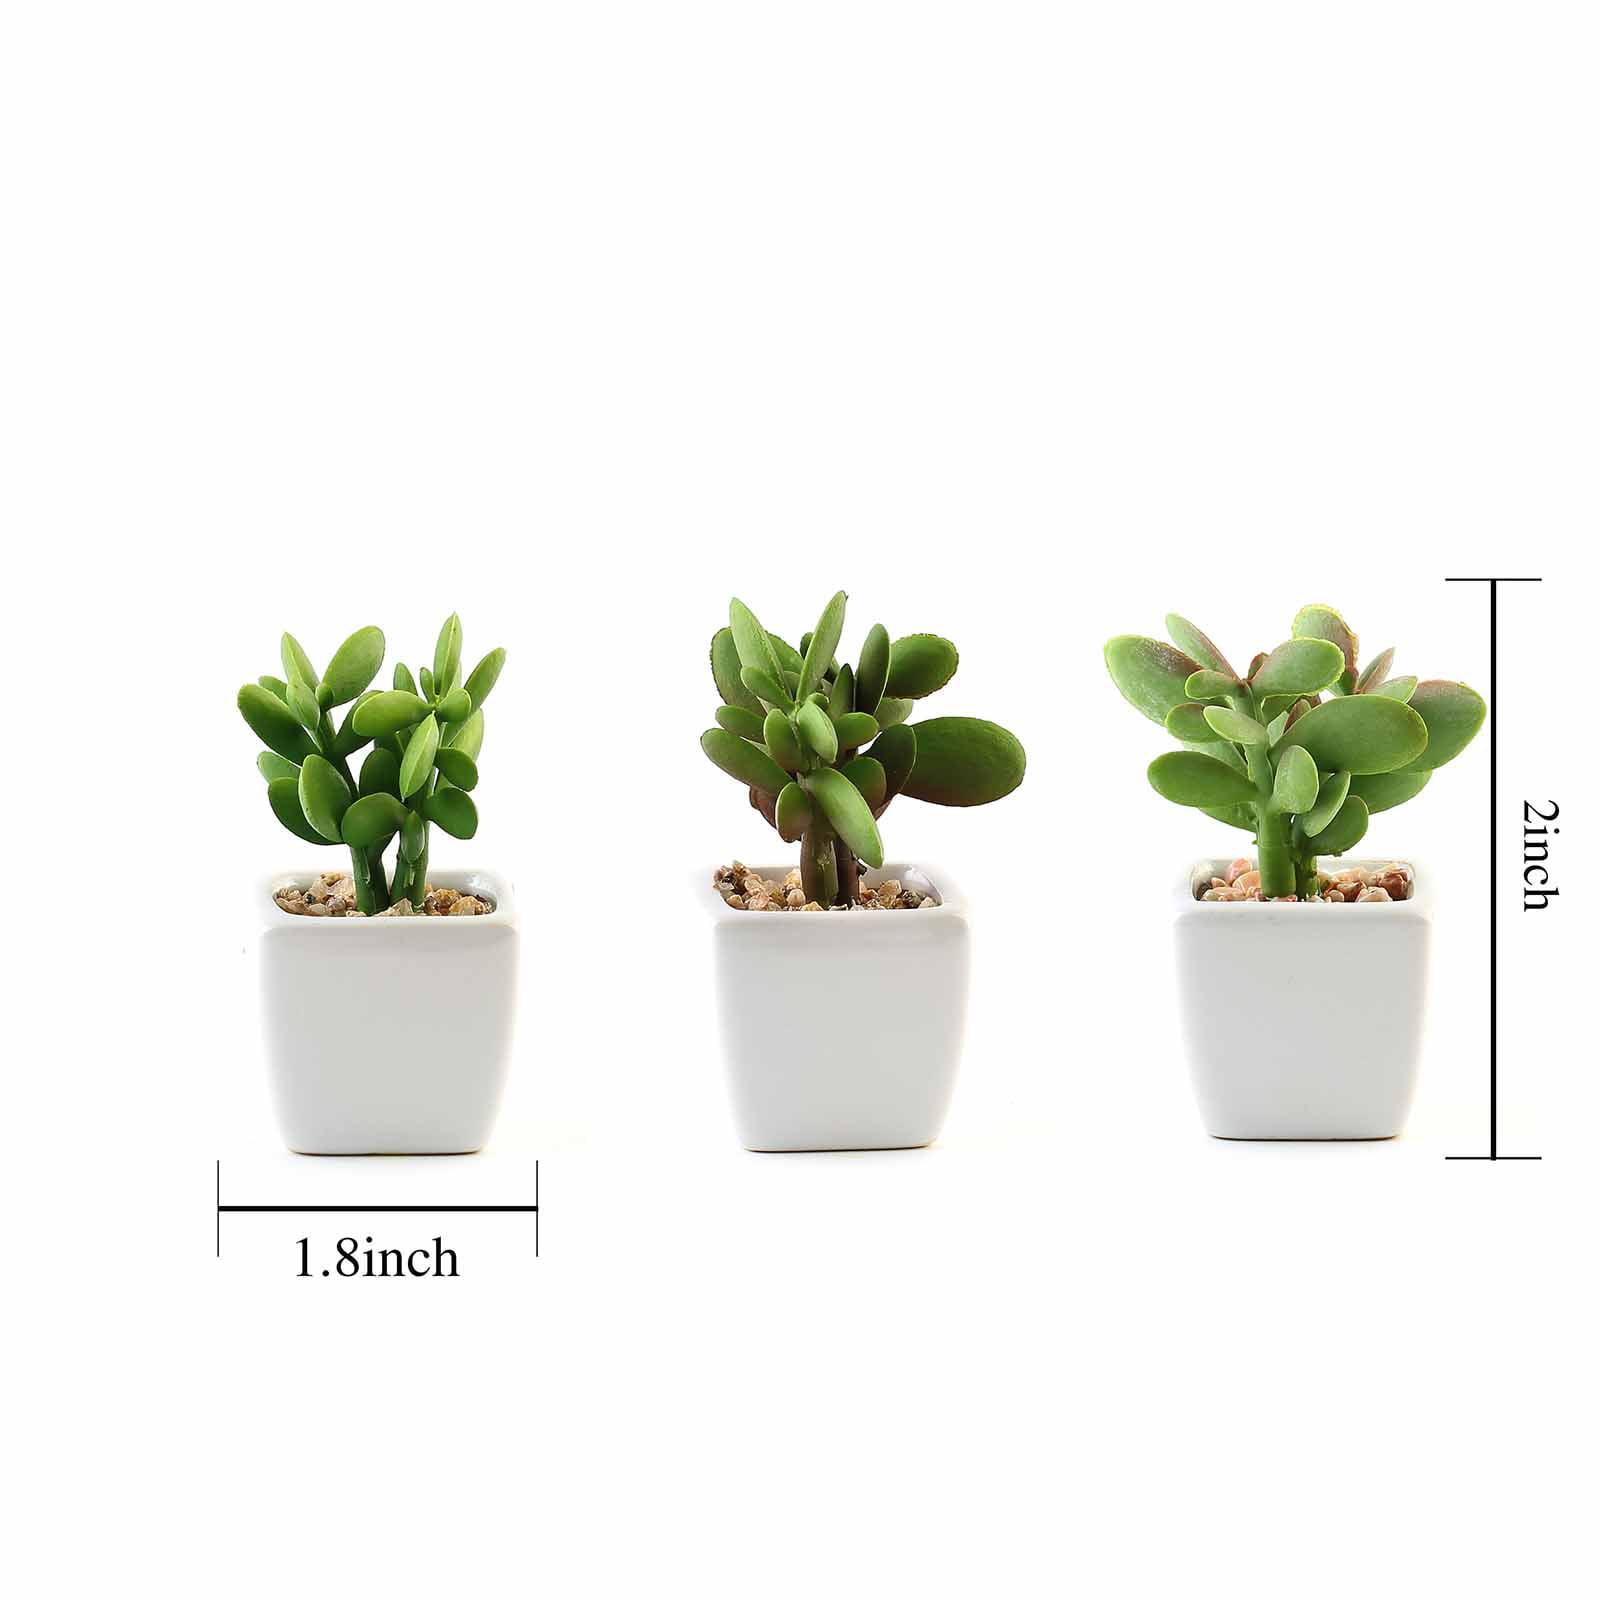 Balsacircle 3 Pcs 3 Inch Green Assorted Artificial Faux Small Succulent Plants With Pots Home Wedding Tabletop Centerpieces Decorations Walmart Com Walmart Com